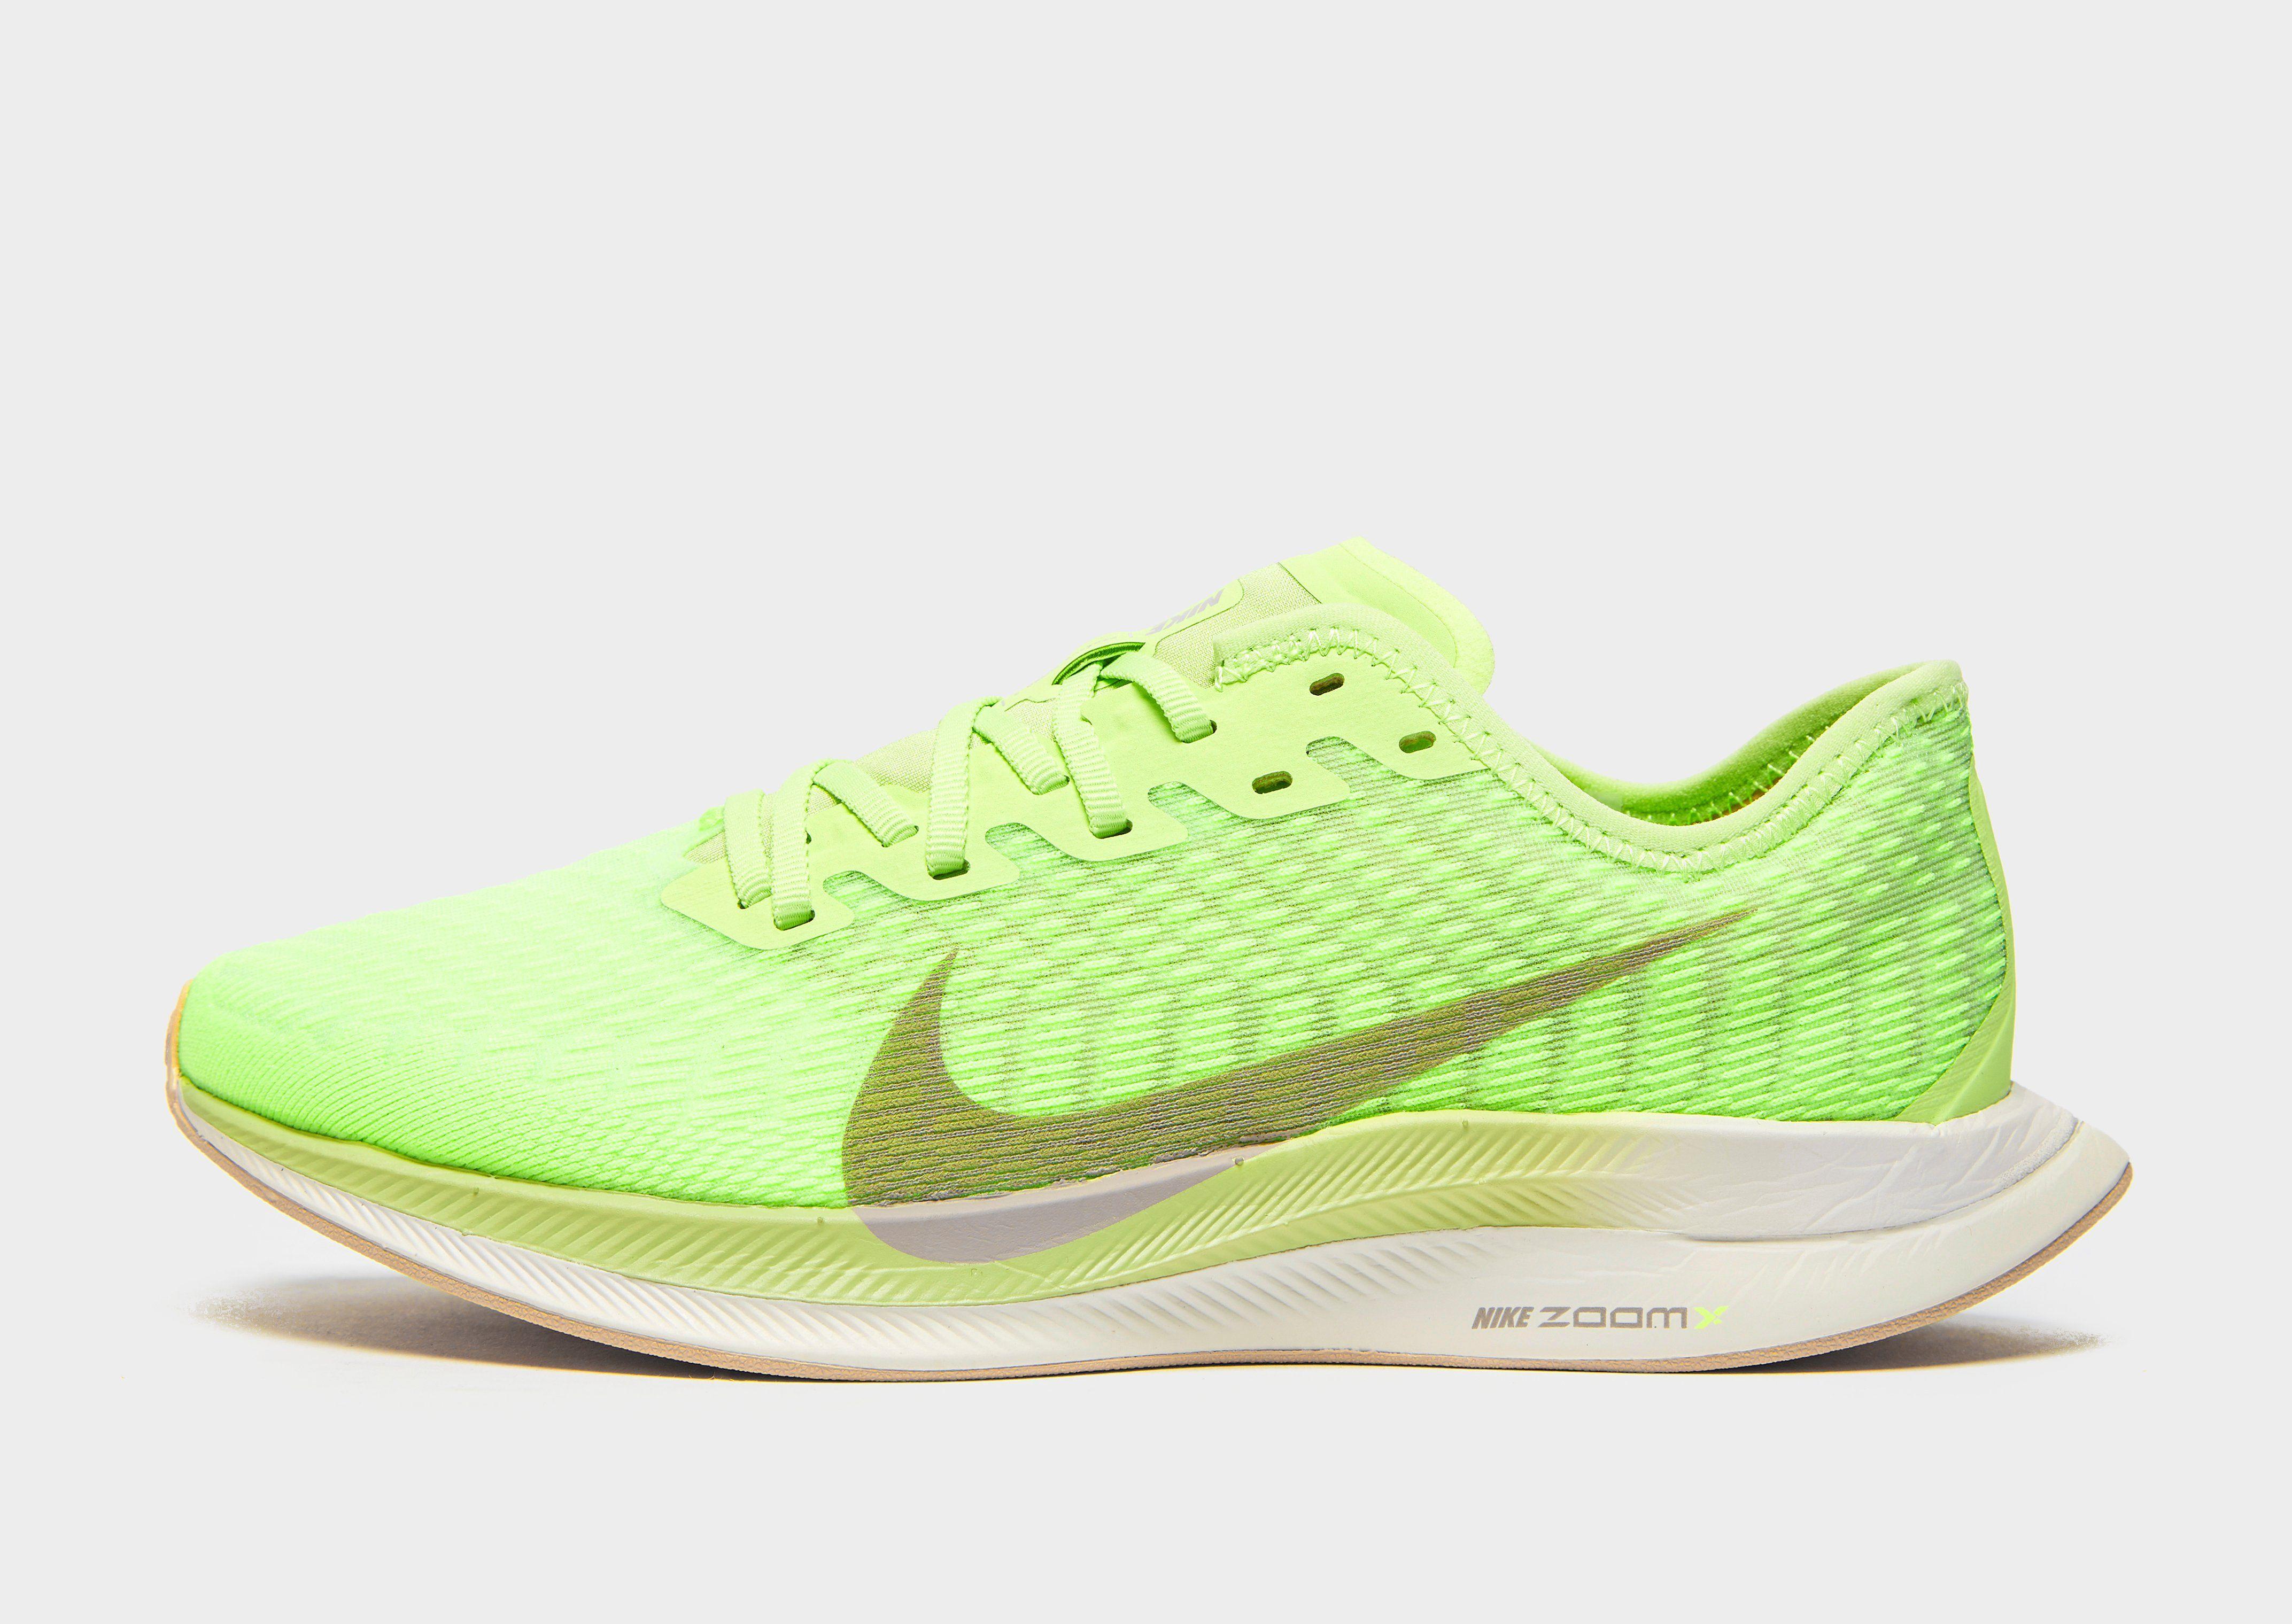 innovative design 58a7f 74598 Nike Zoom Pegasus Turbo 2 Women's | JD Sports Ireland